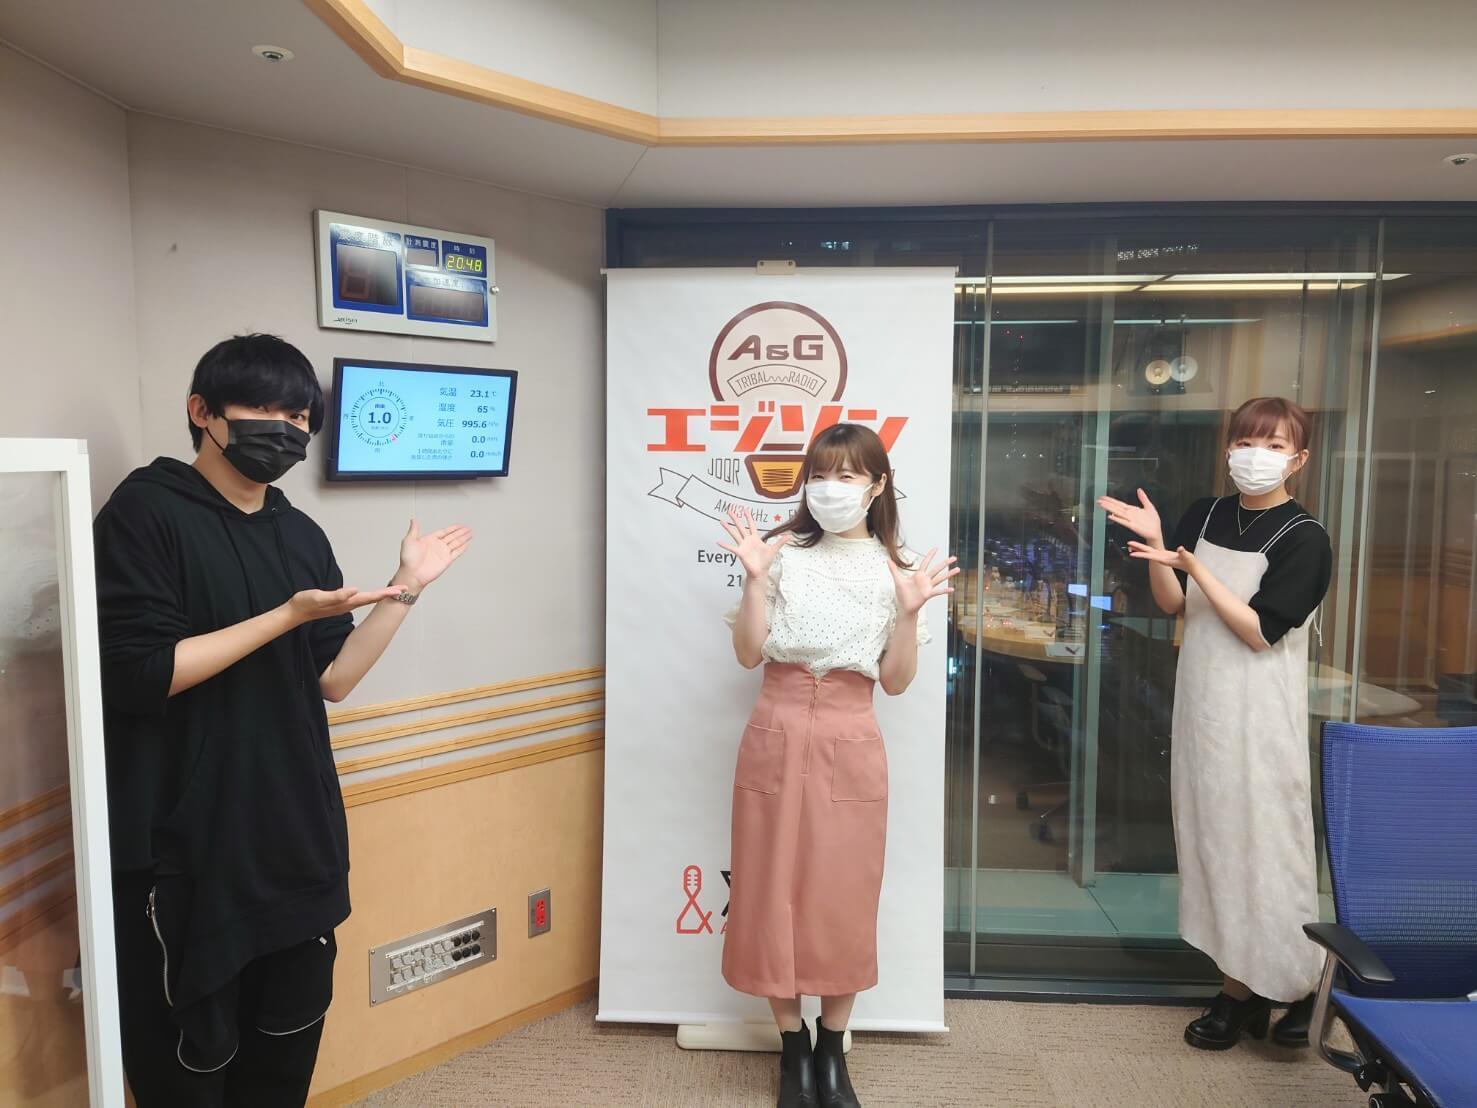 A&G TRIBAL RADIO エジソン! 2021年5月29日 放送後記